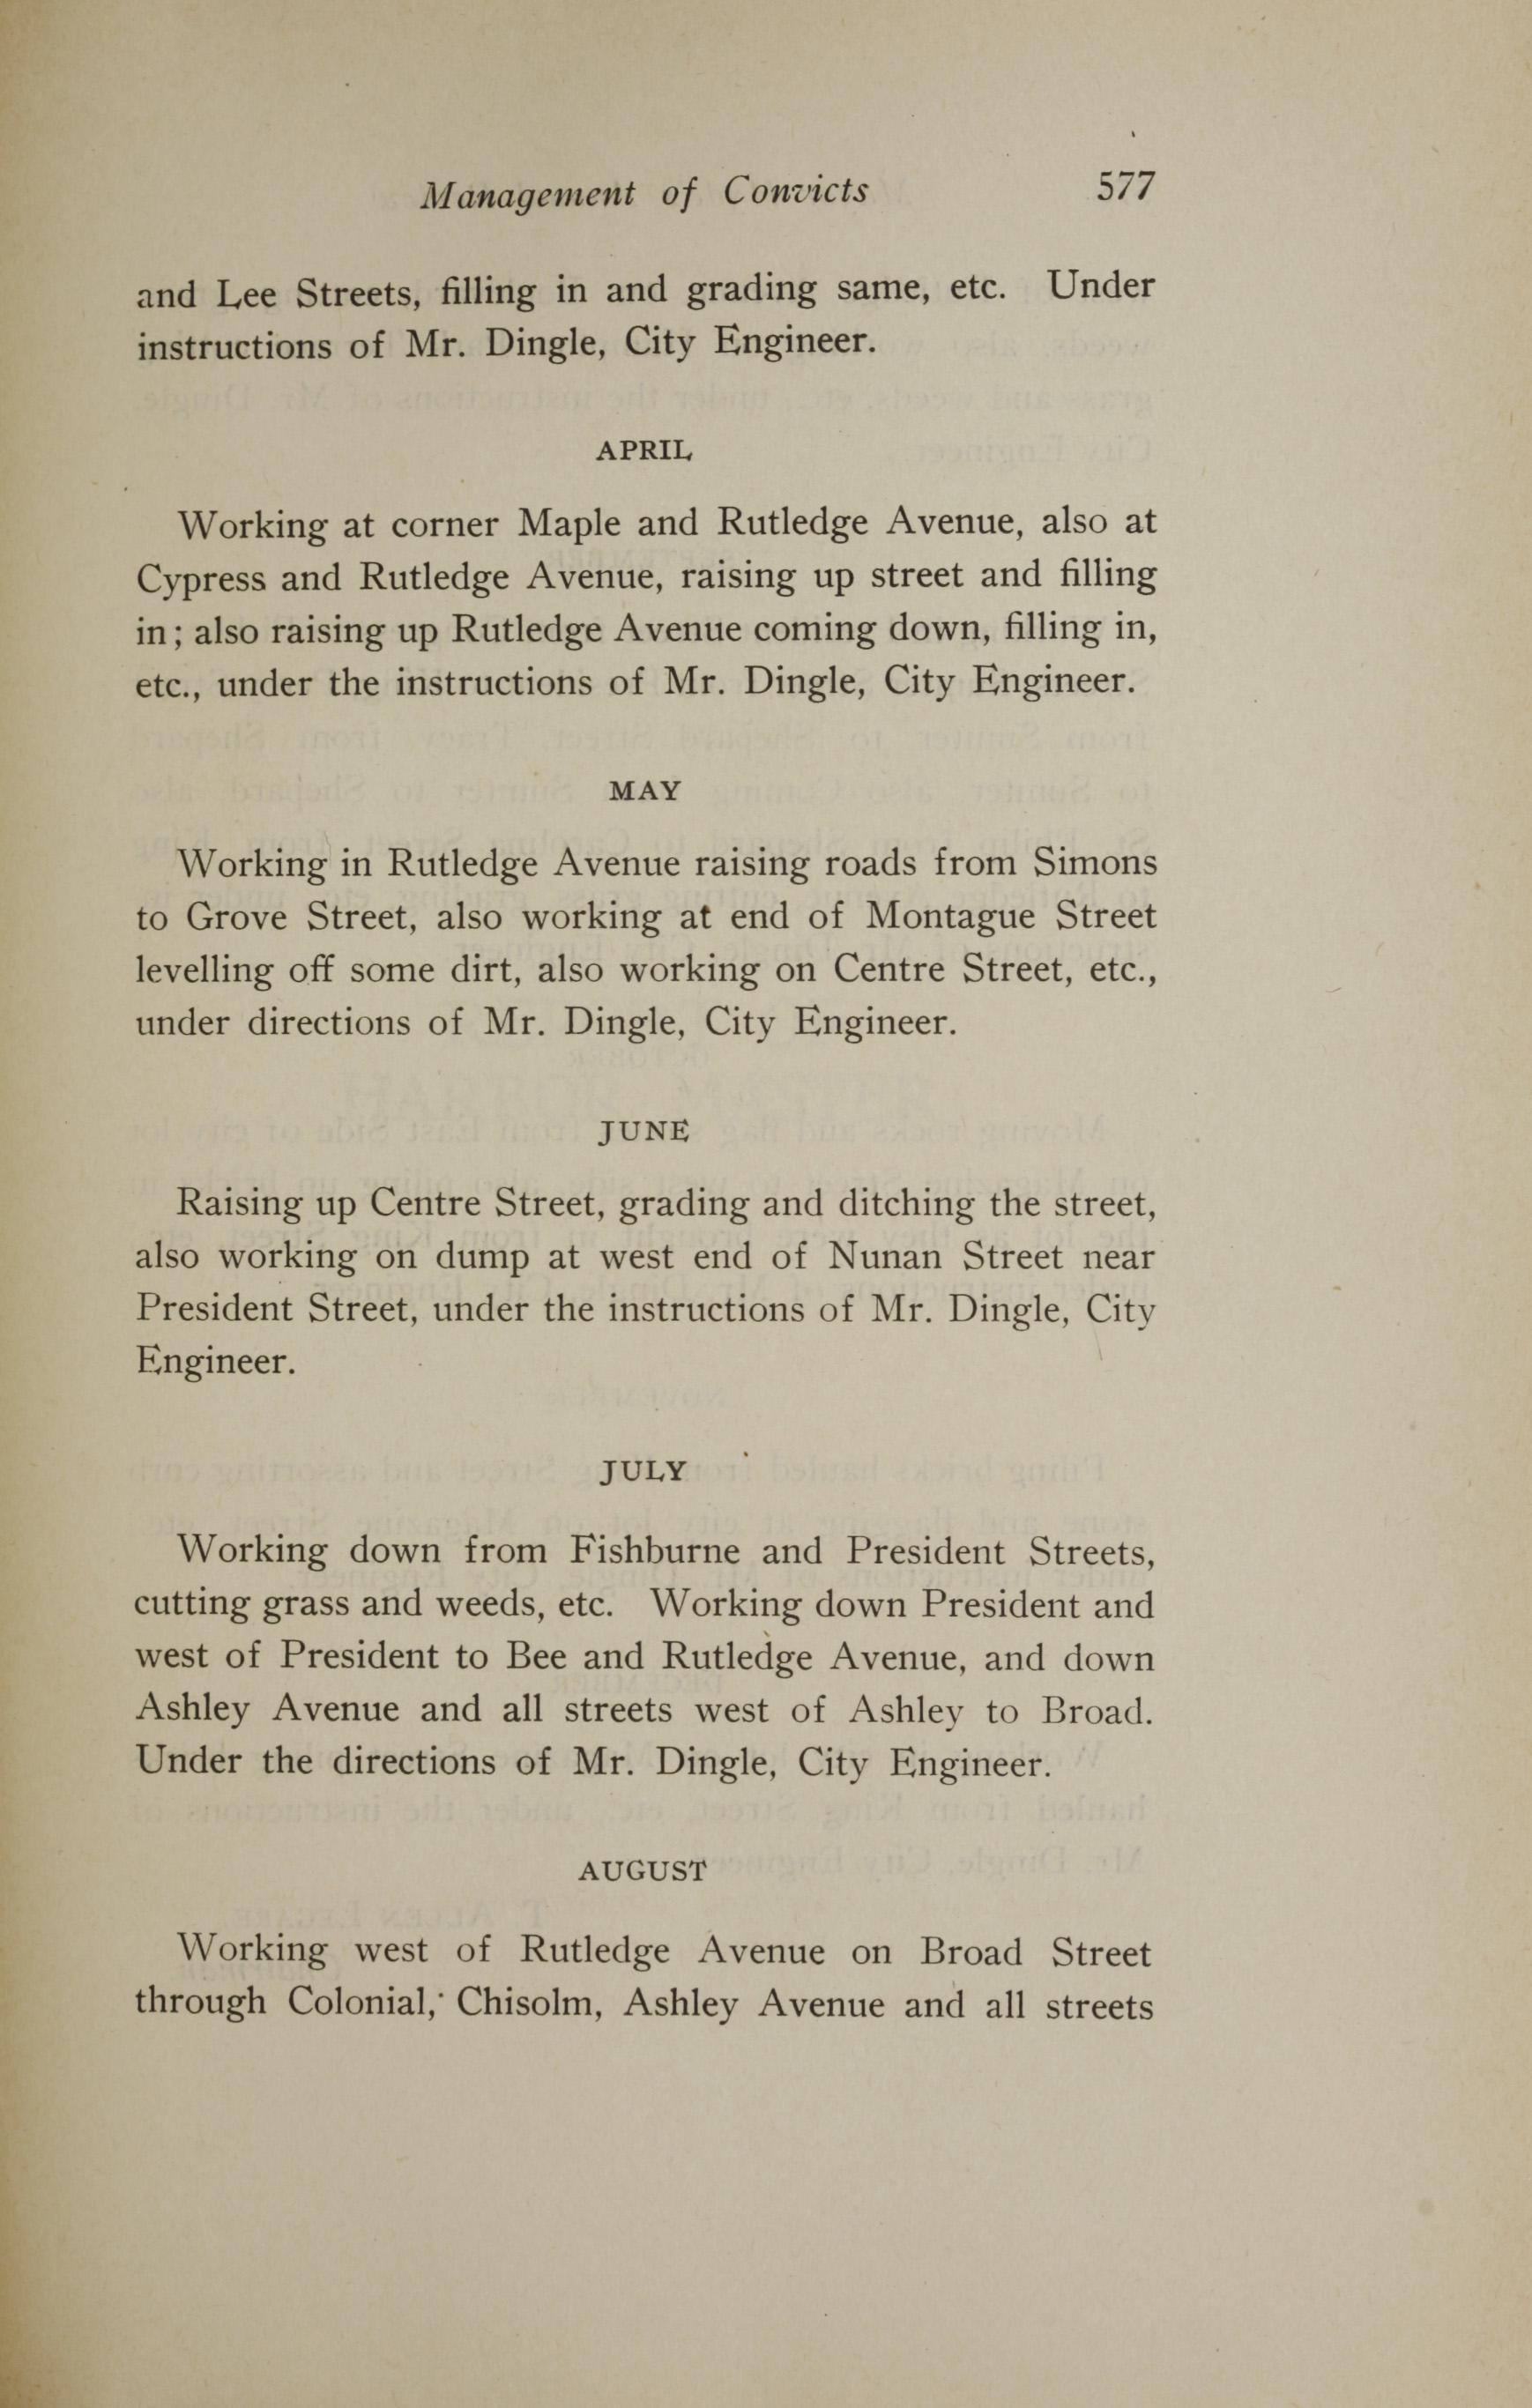 Charleston Yearbook, 1919, page 577